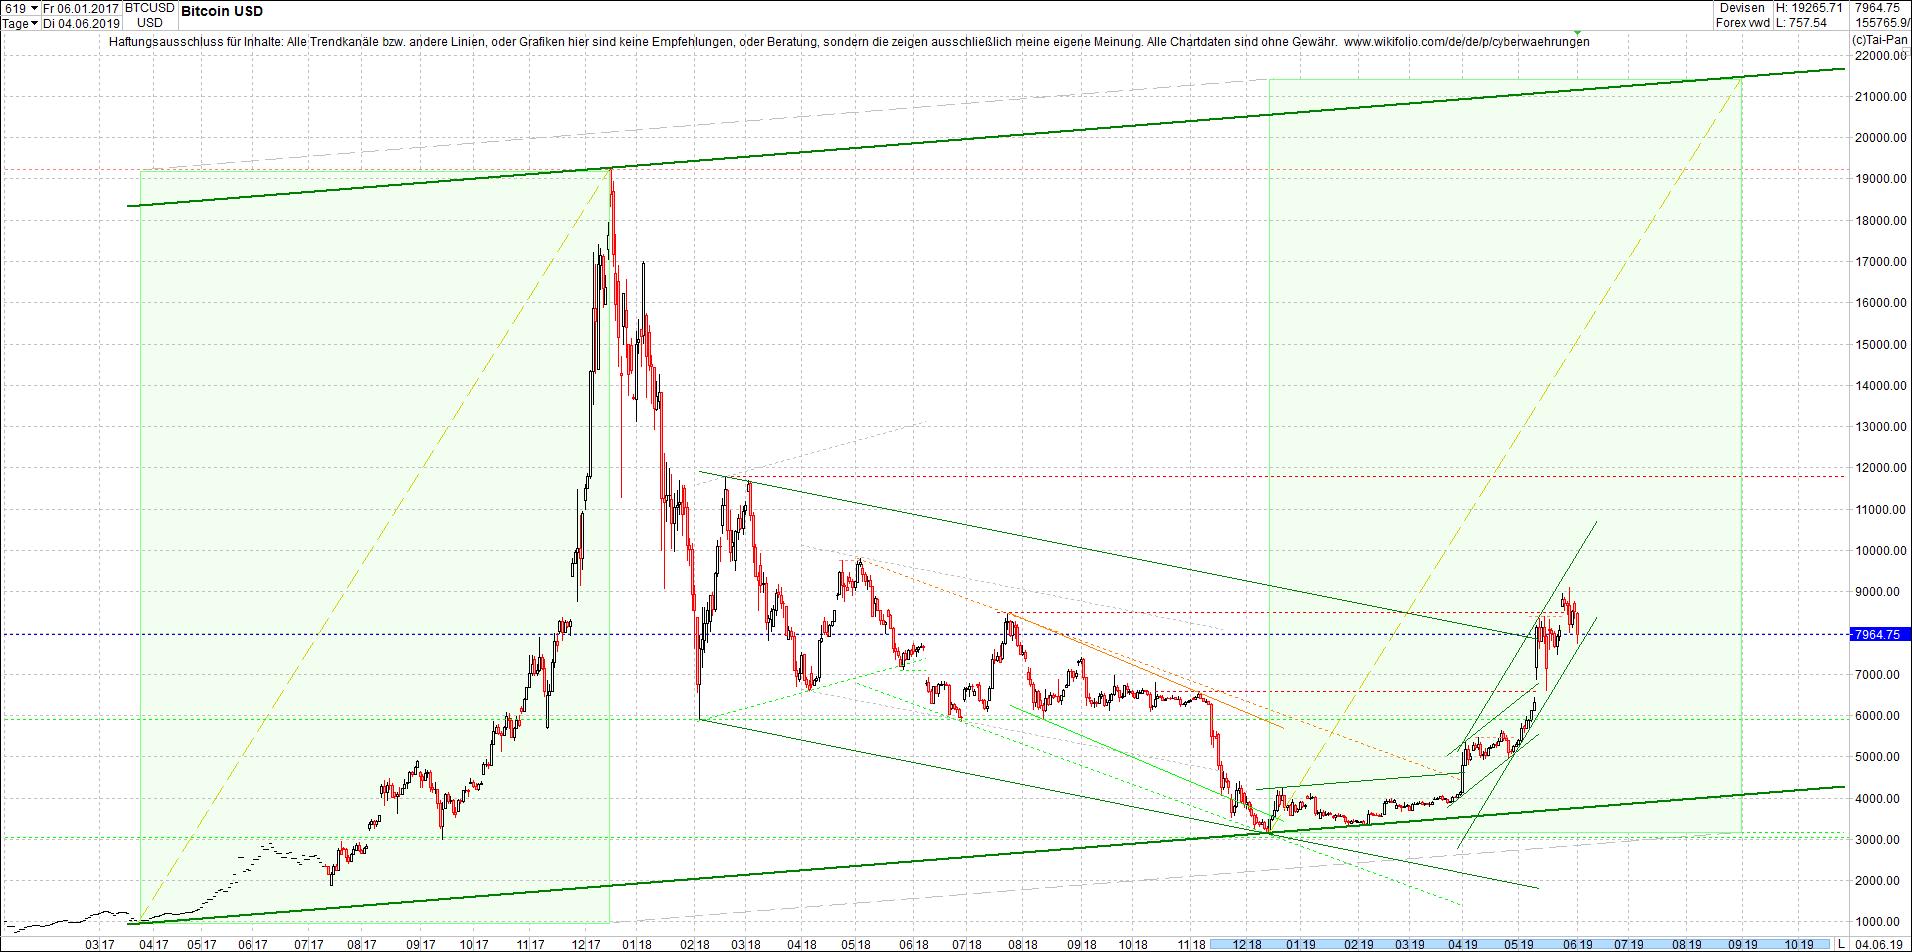 bitcoin_(btc)_chart_heute_mittag.png